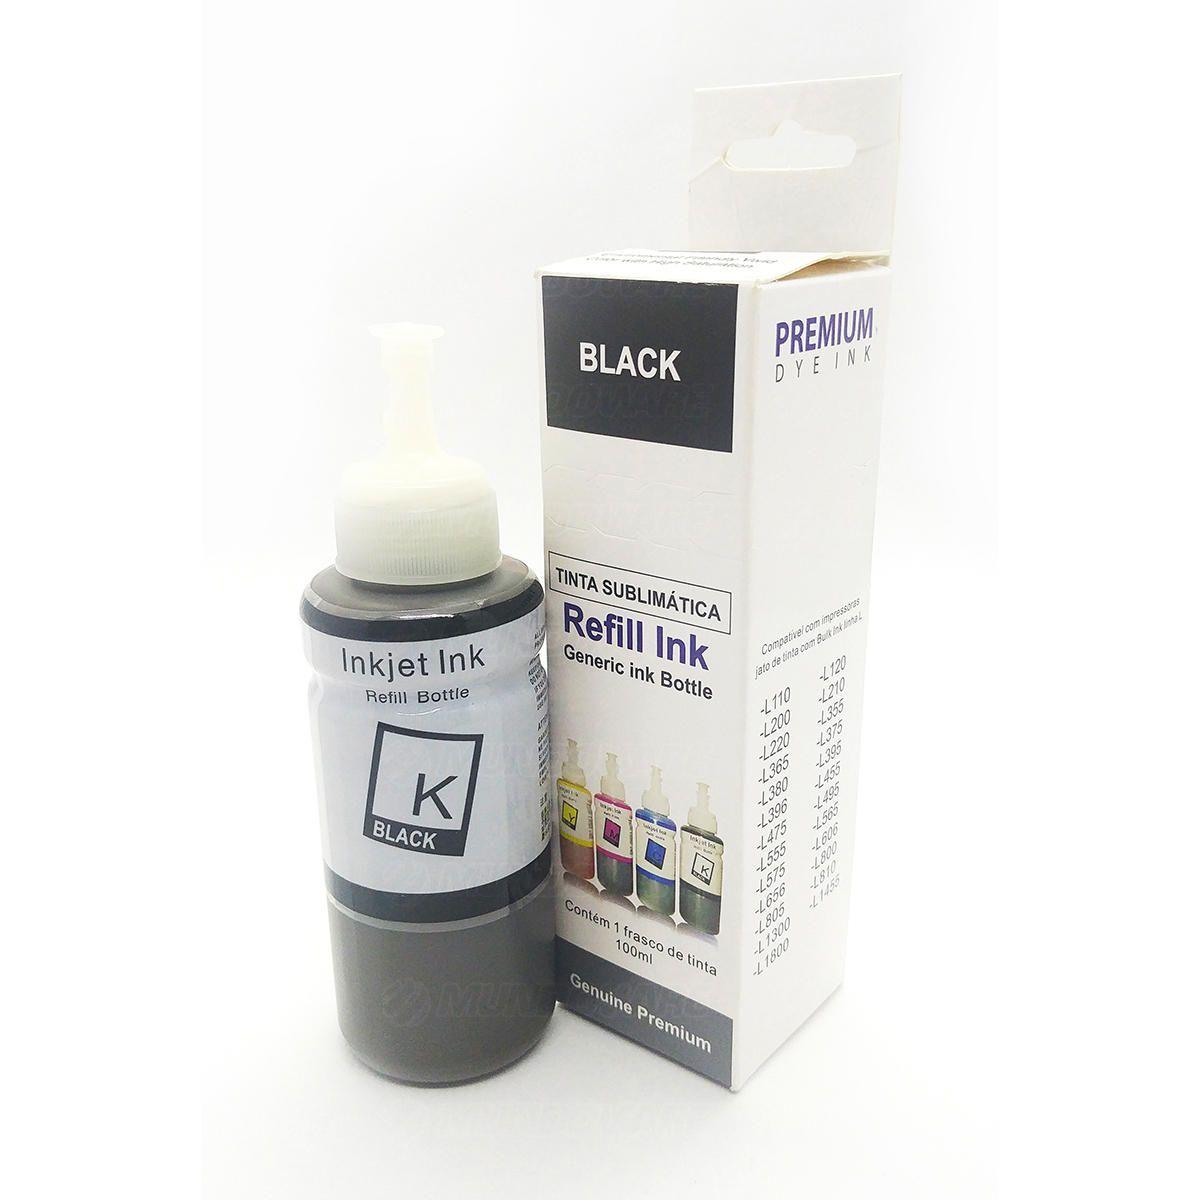 Compatível: Tinta Sublimática Laserteck para Sublimação para Epson L355 L365 L375 L395 L575 L1300 / Preto / Refil 100ml